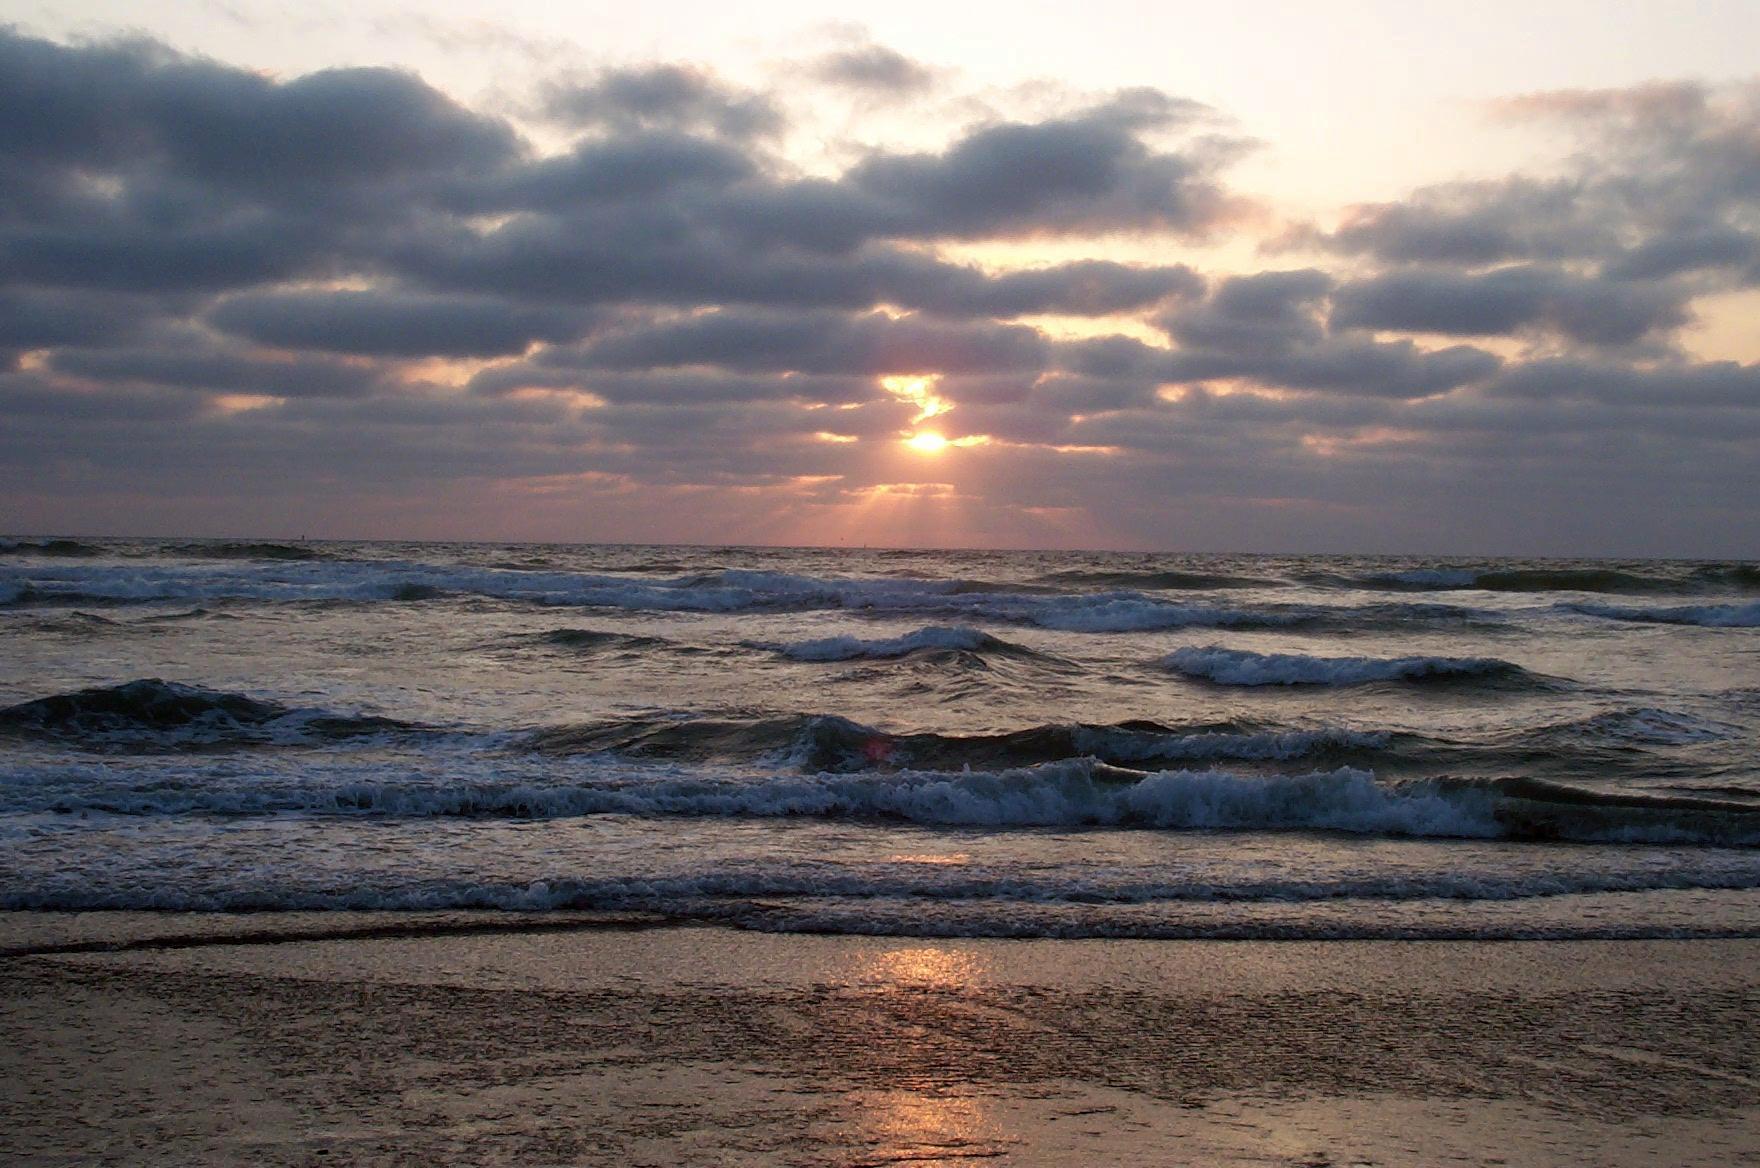 Oregon Shores: 40 Years of Protecting Oregon's Coast